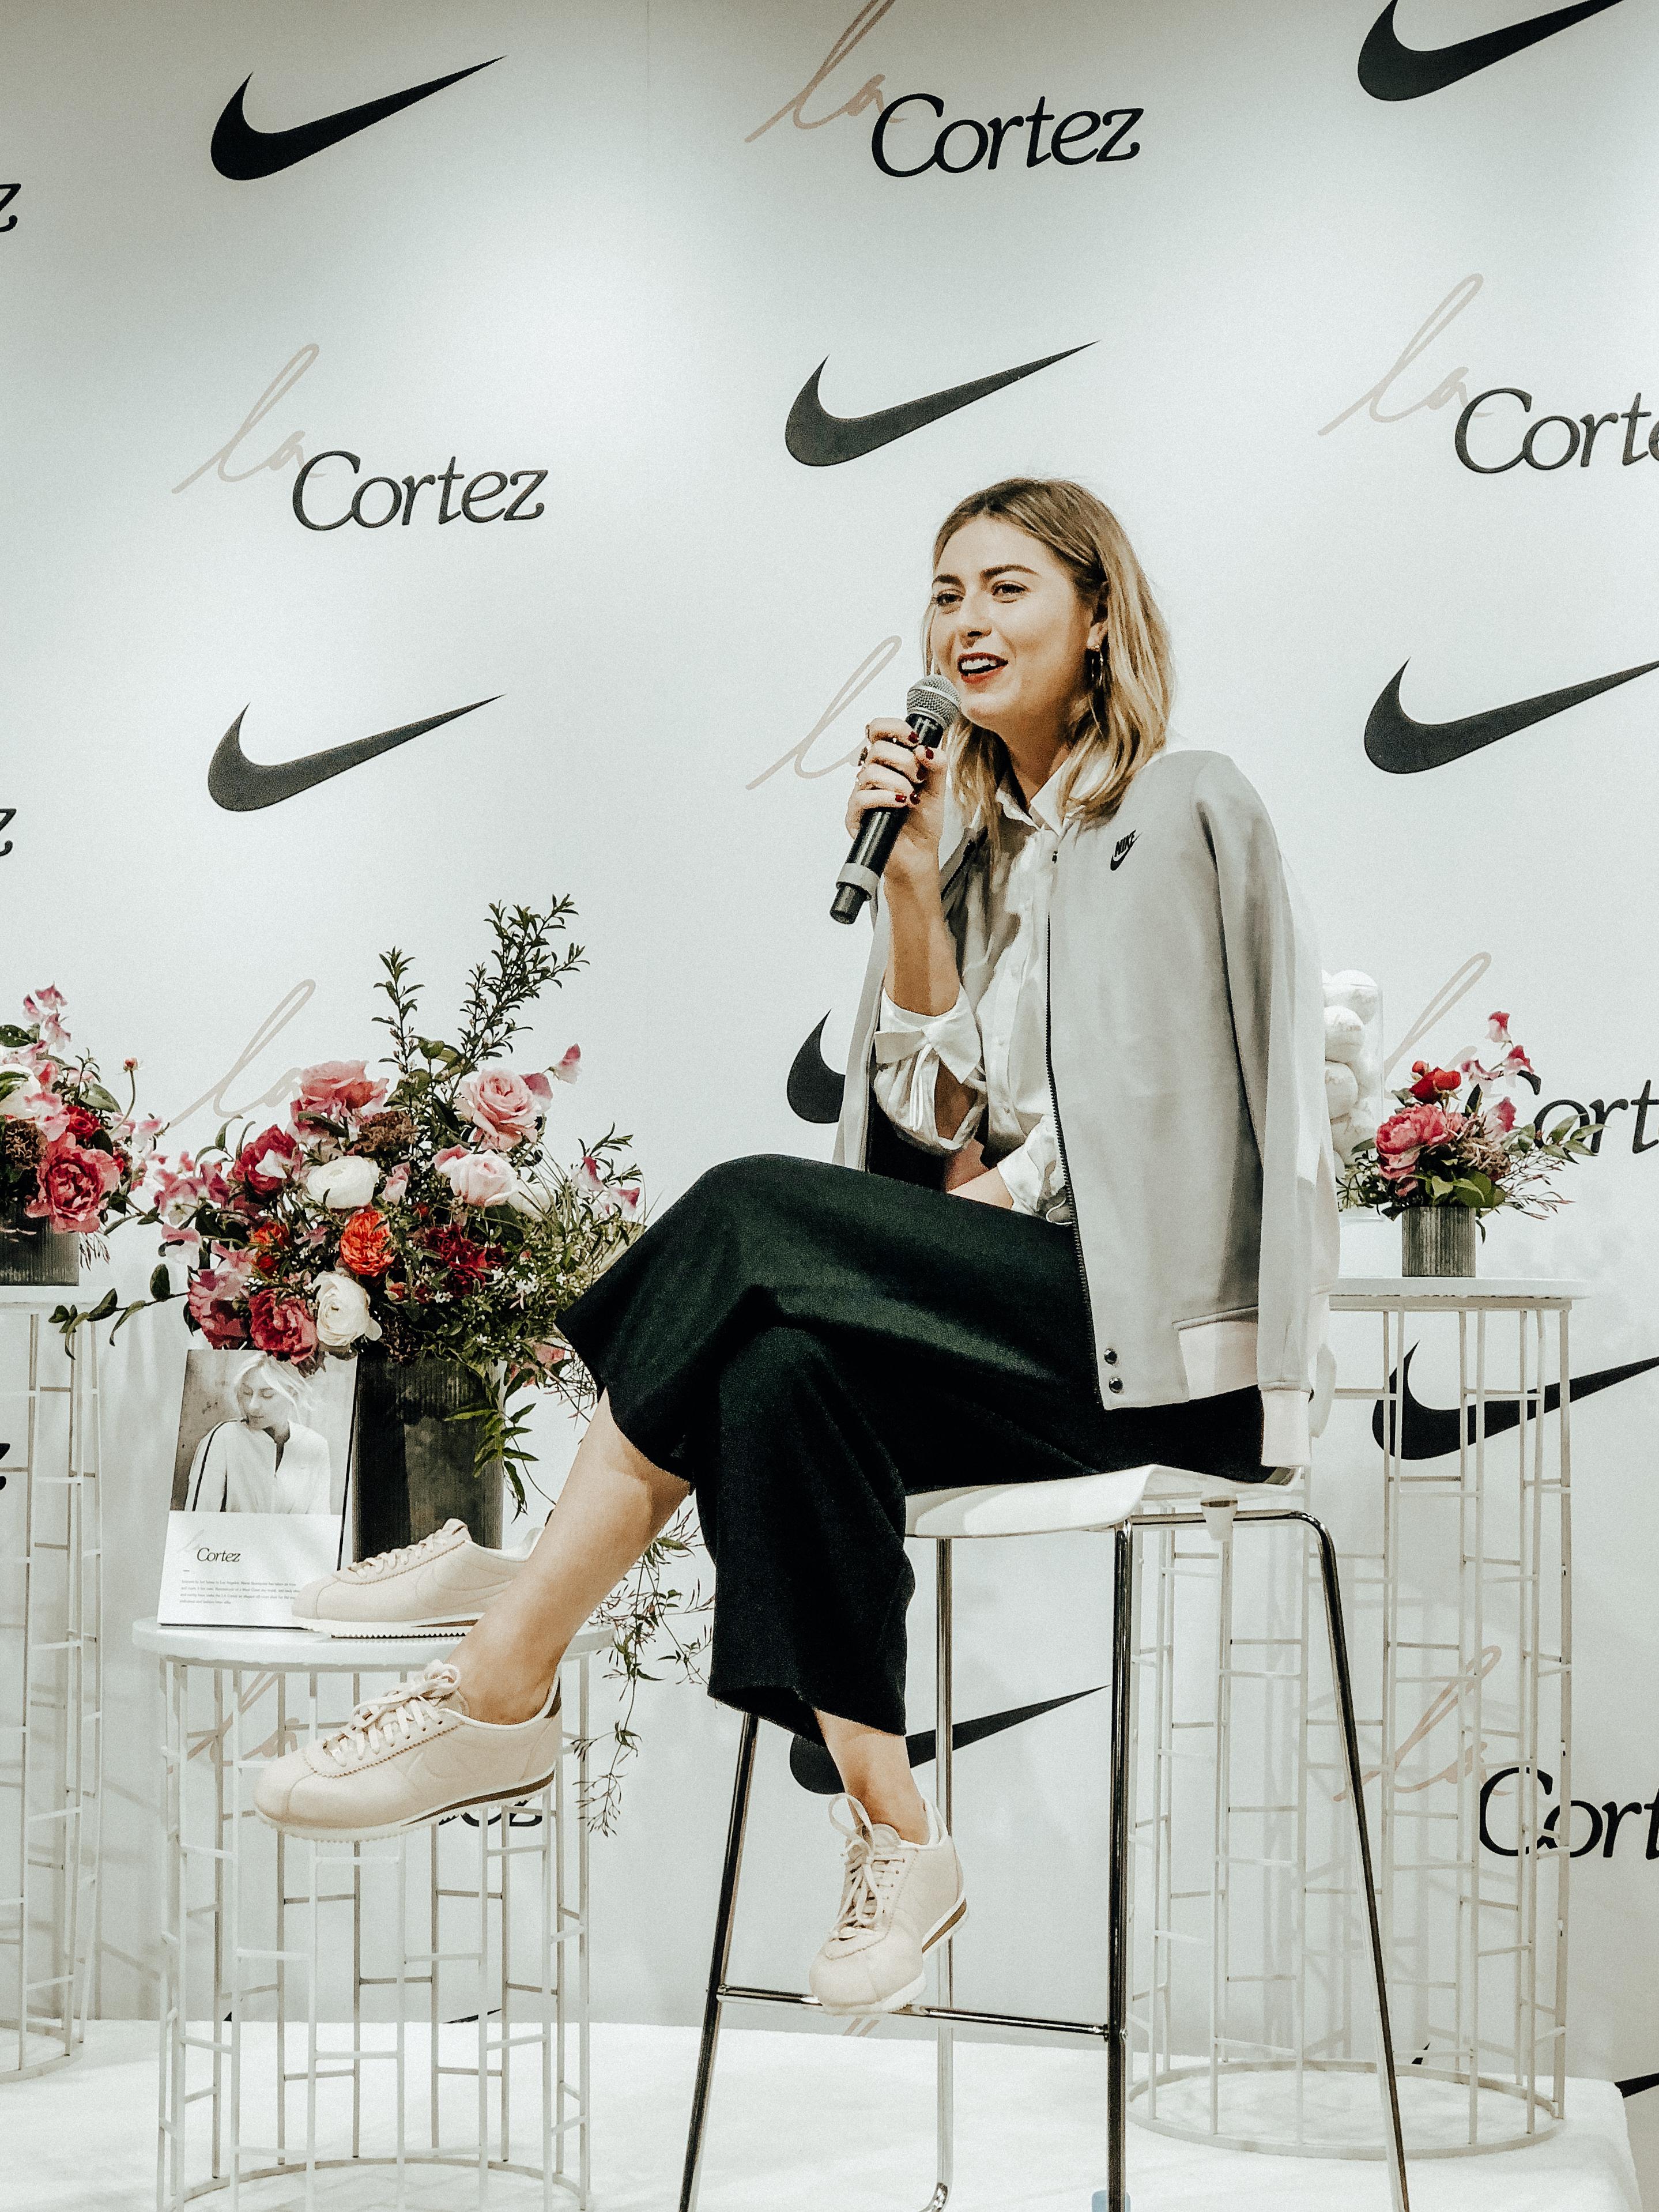 online store 7a887 b95f6 Maria Sharapova: Nike LA Cortez Launch – Juliann Cheryl